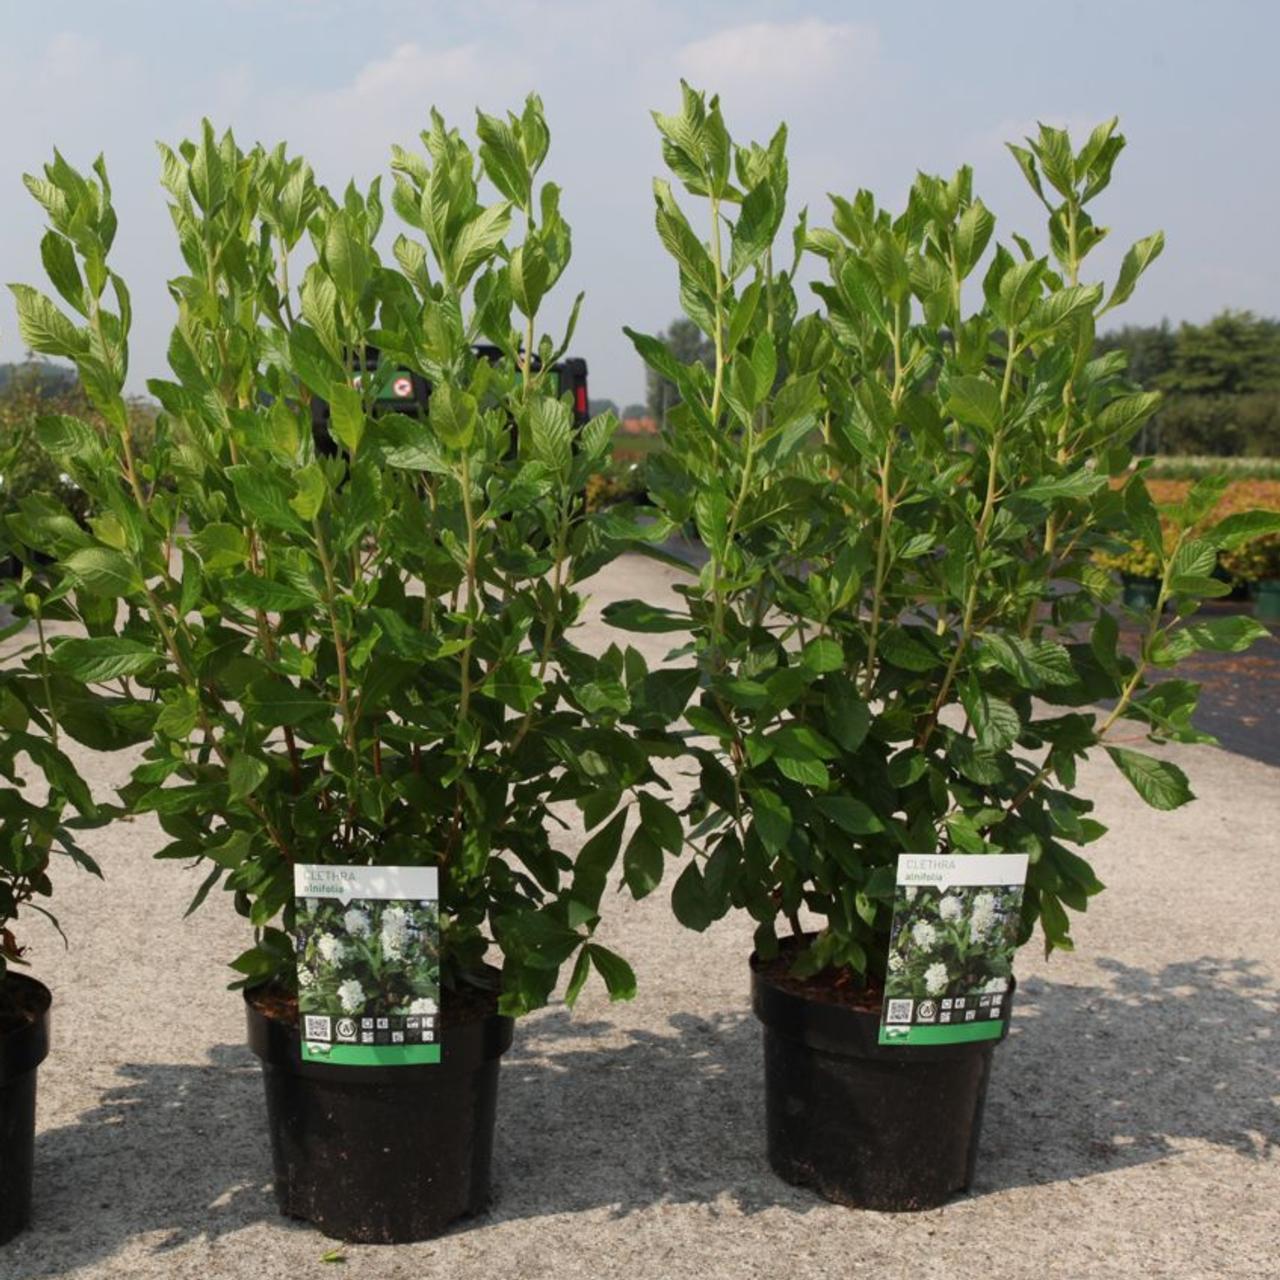 Clethra alnifolia plant